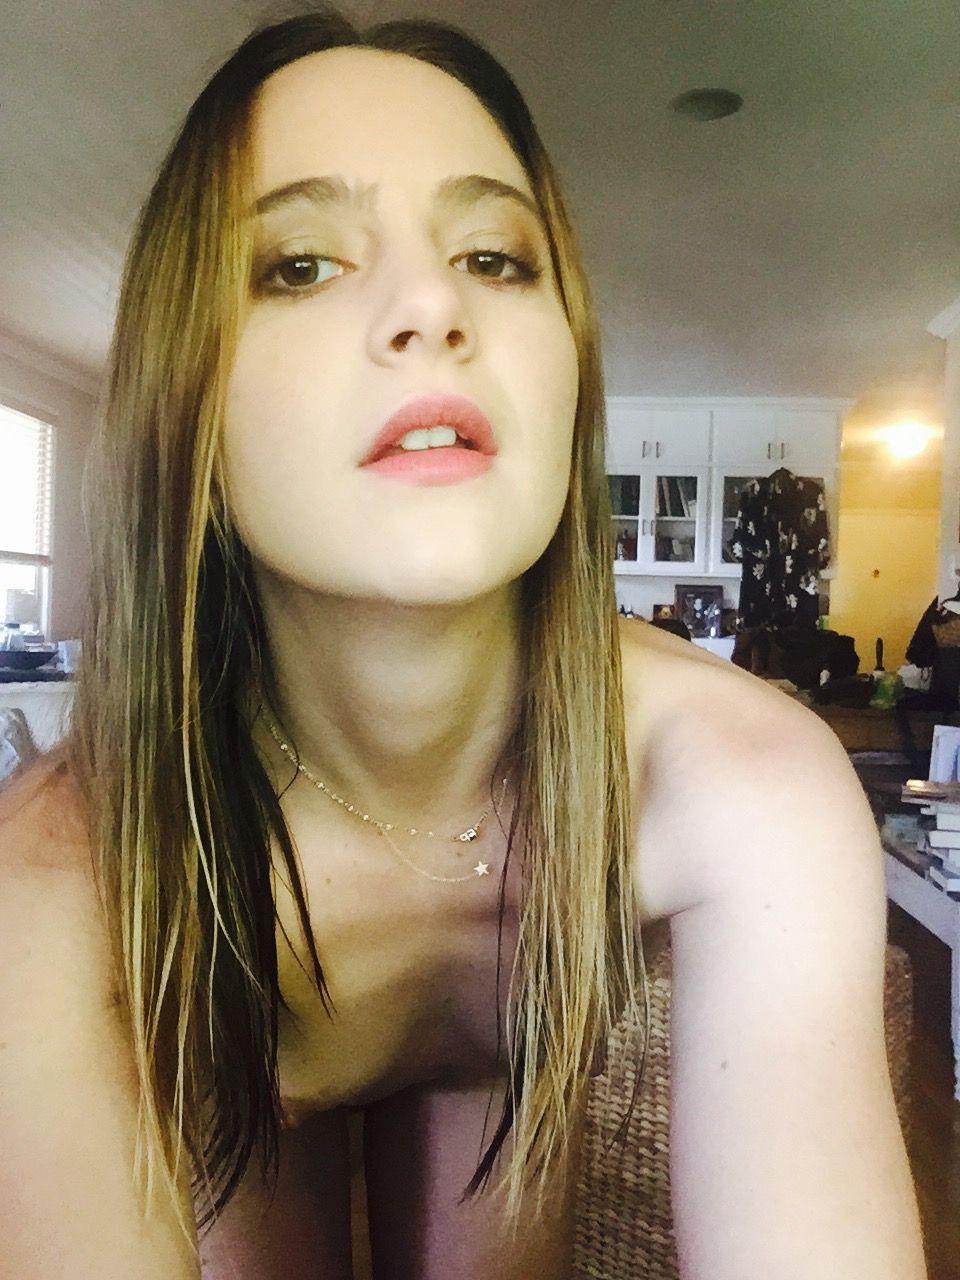 Alexa Nikolas nude photos and video leaked The Fappening